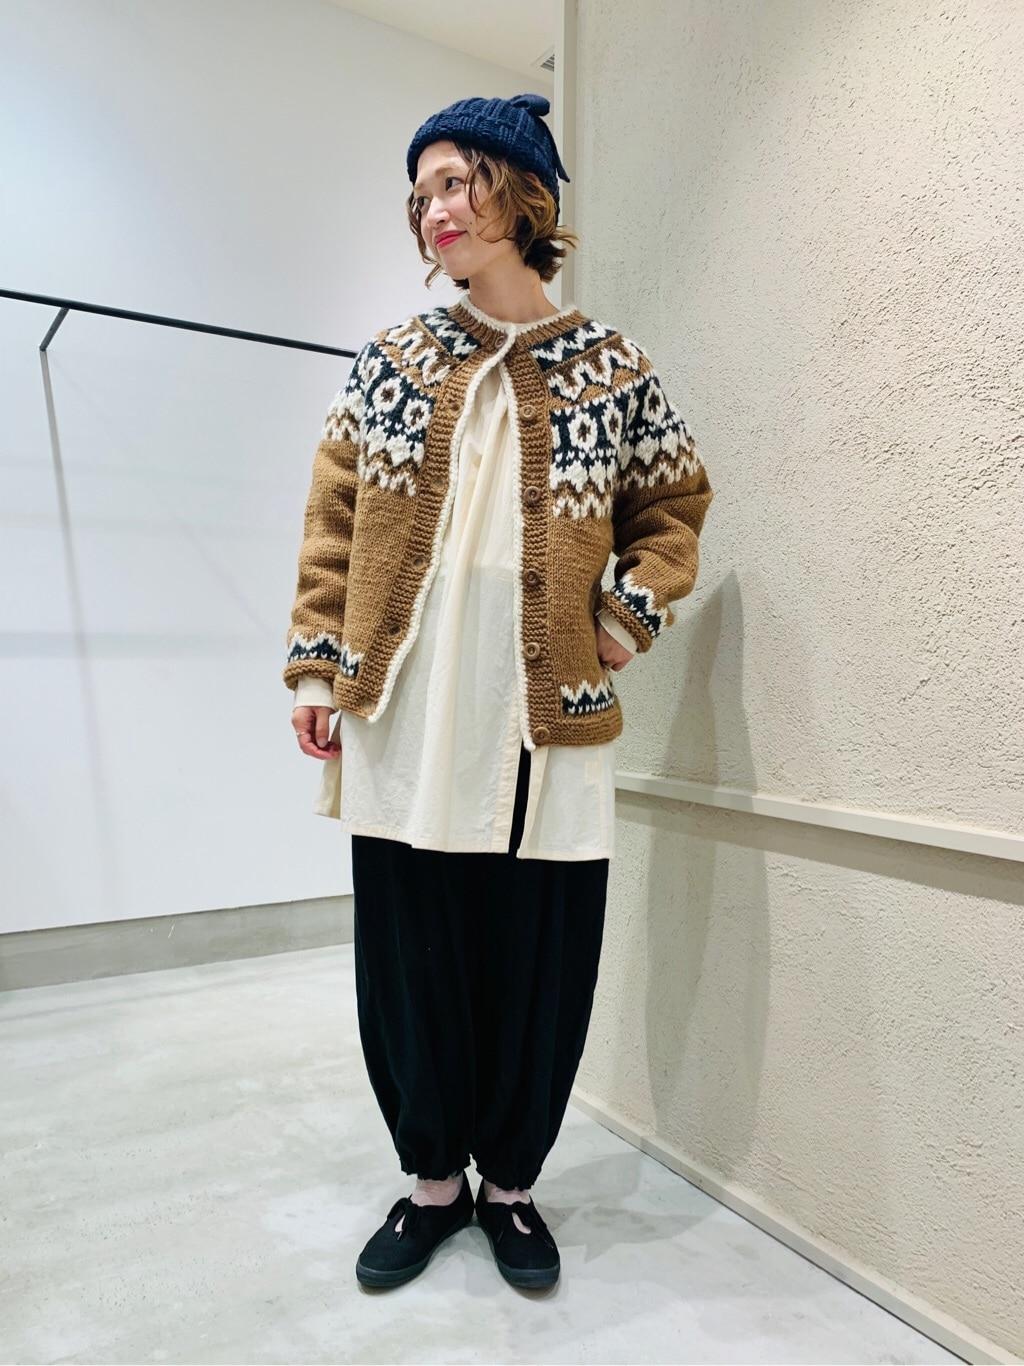 chambre de charme 横浜ジョイナス 身長:160cm 2020.11.03